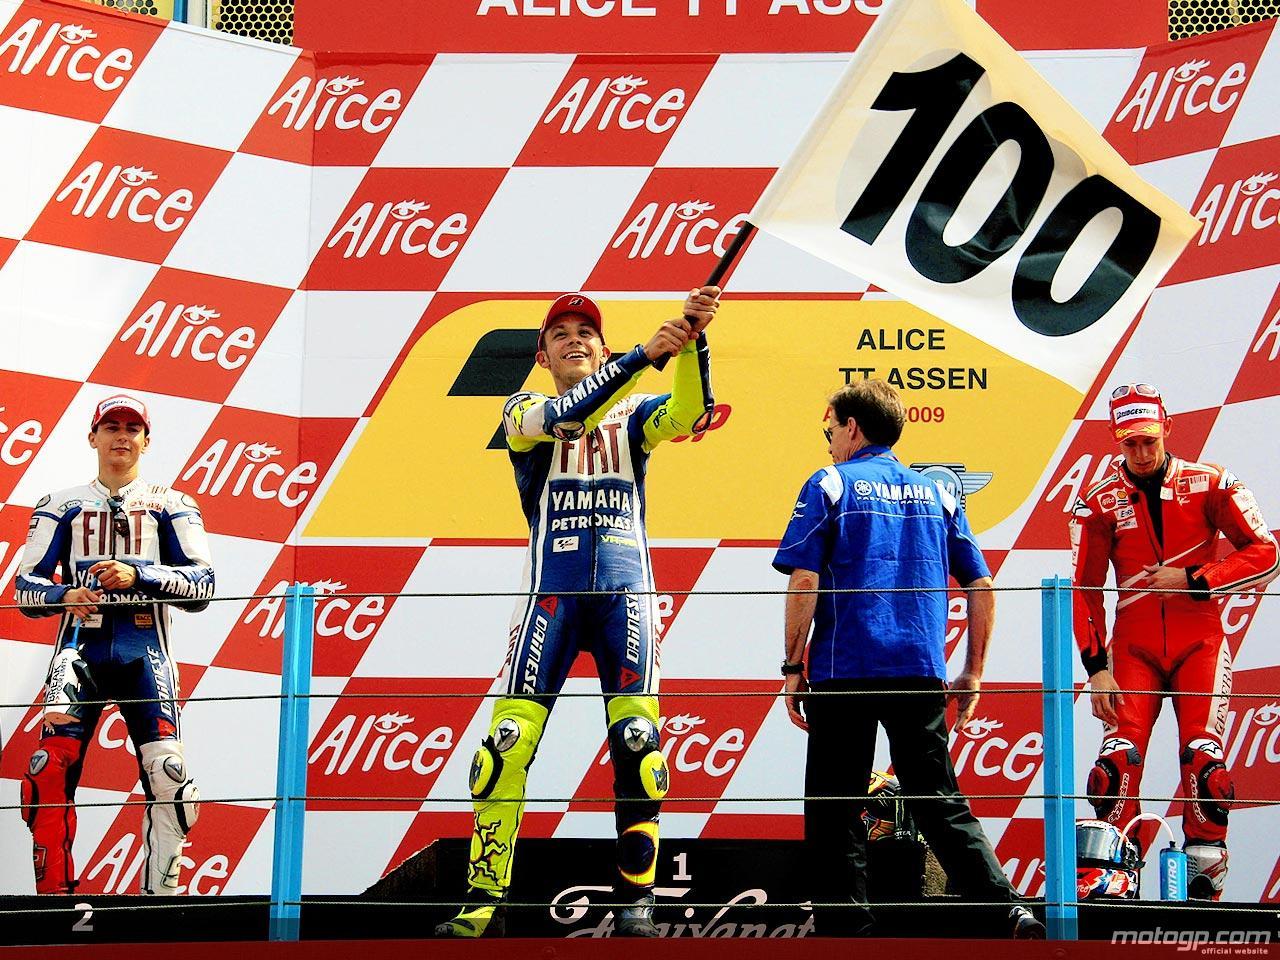 2009-motogp-race-rep-4